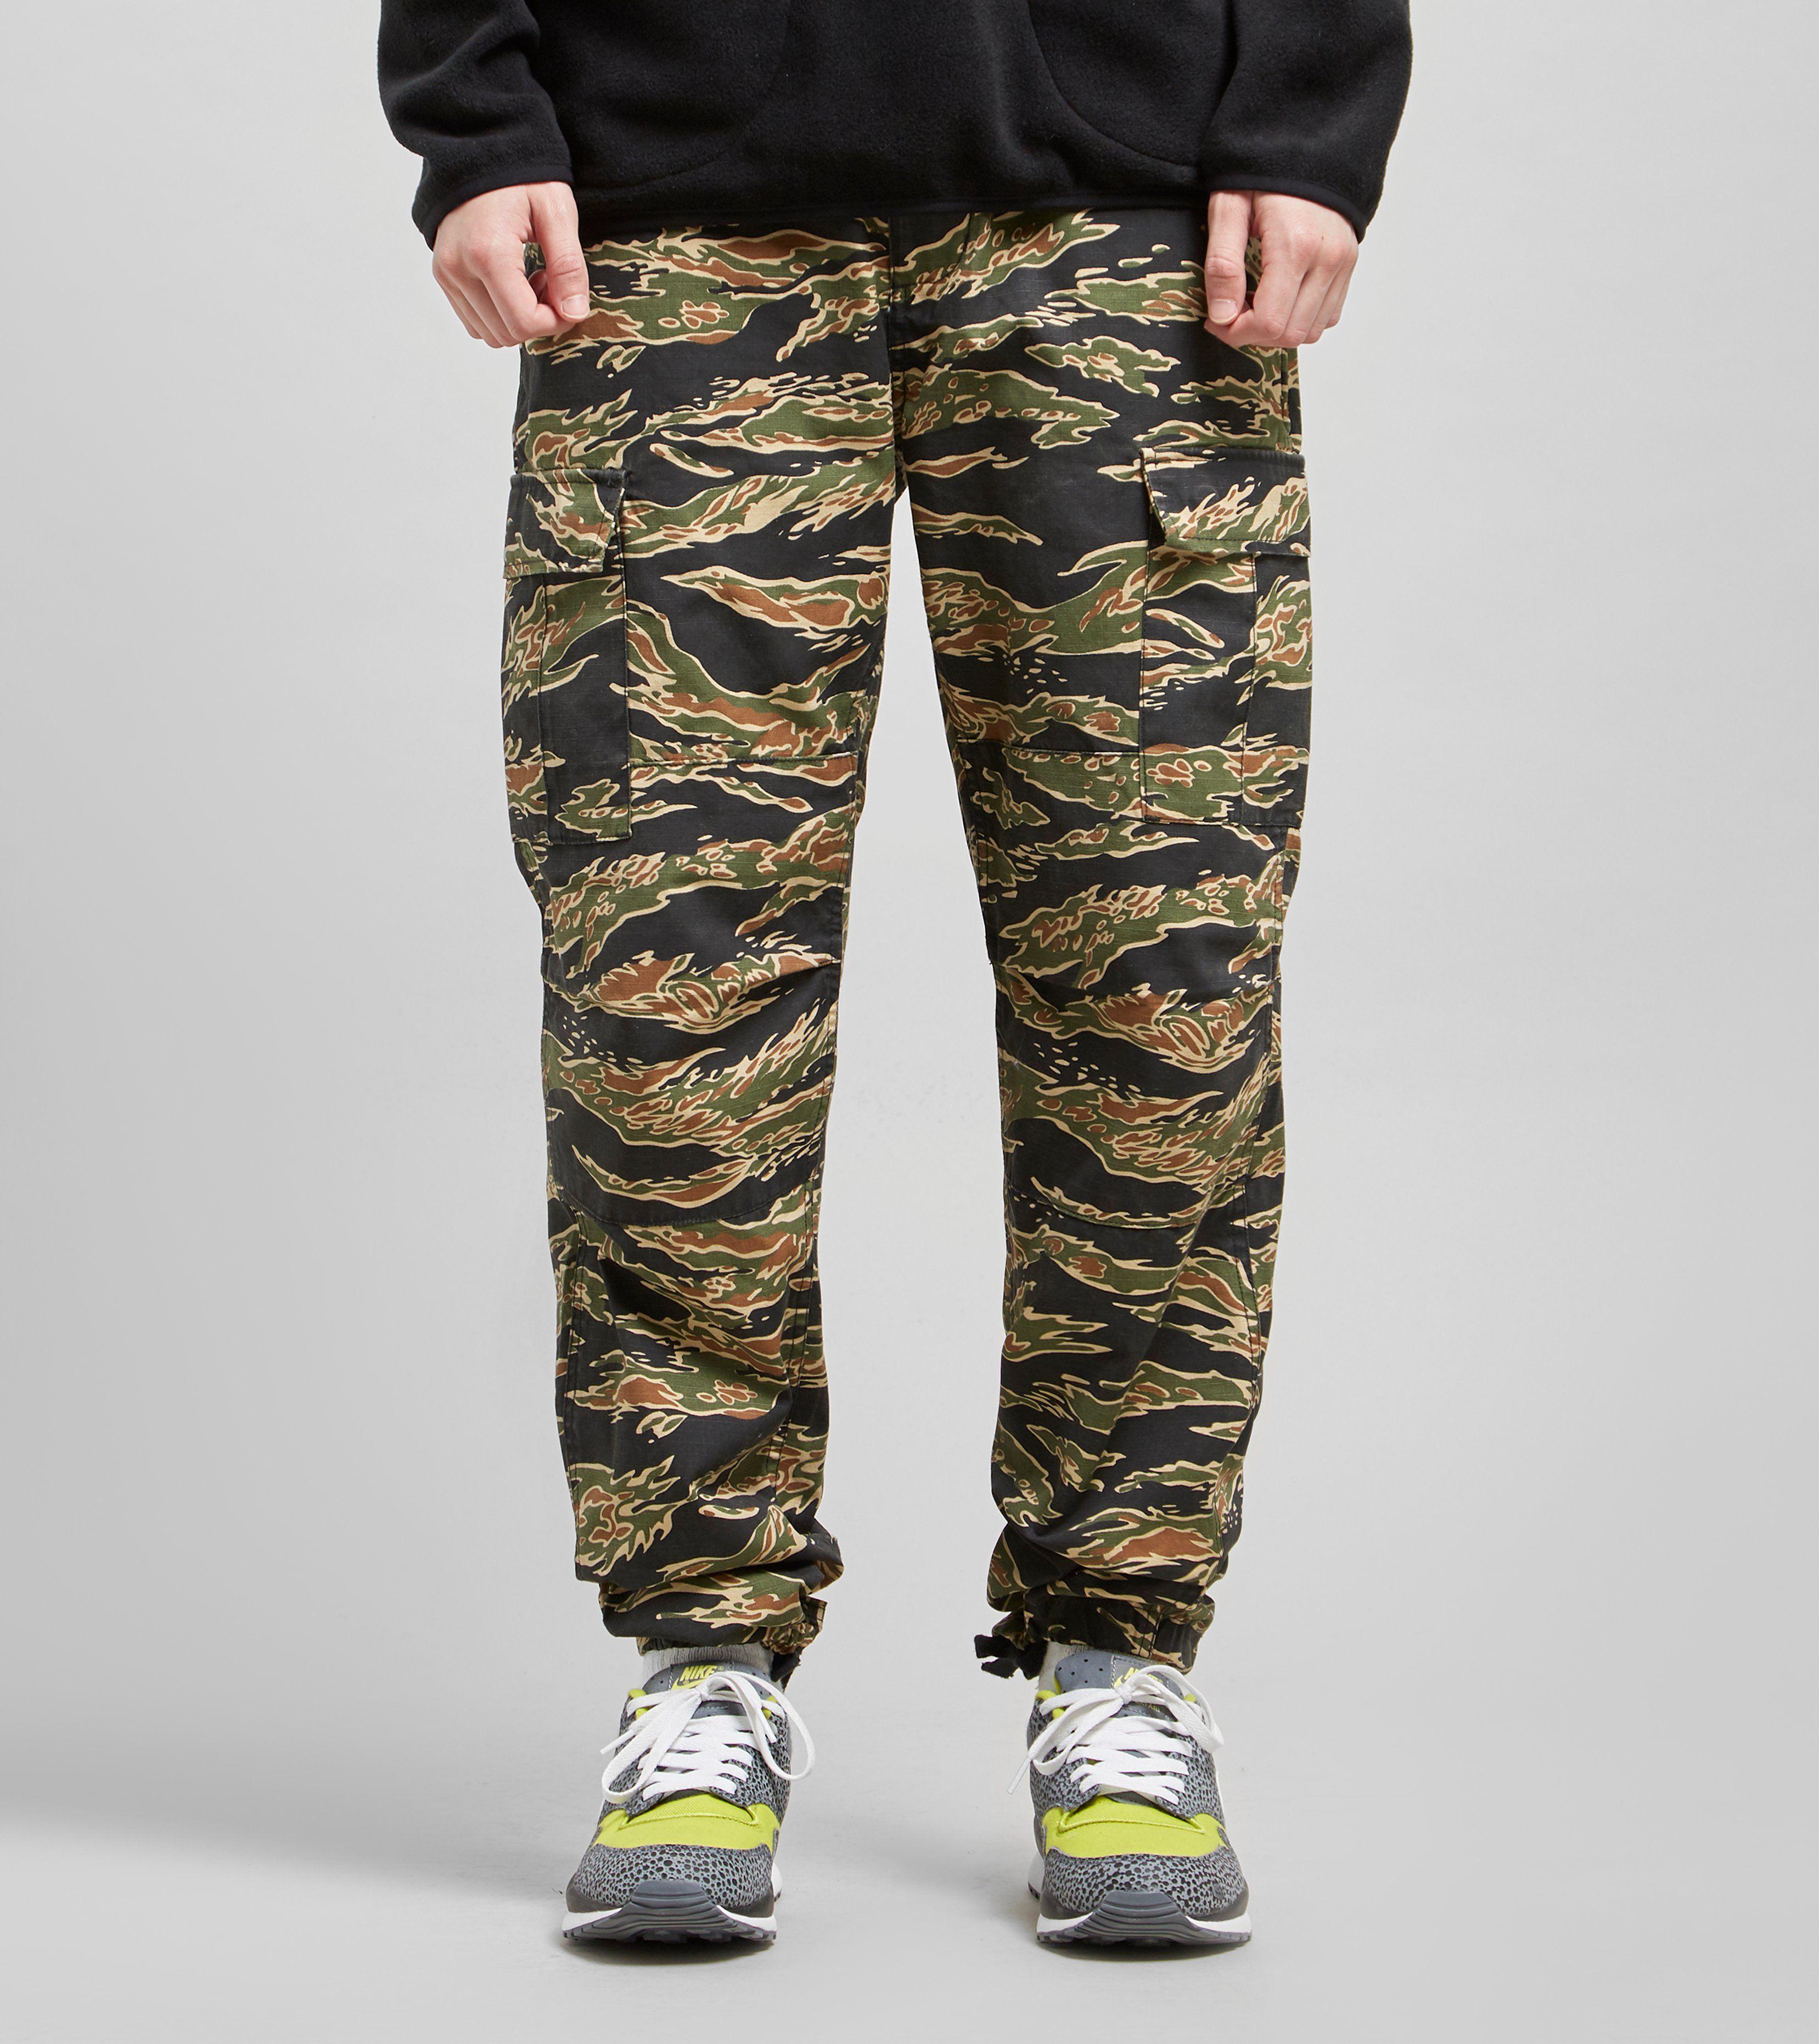 Obey Pantalon Recon Cargo